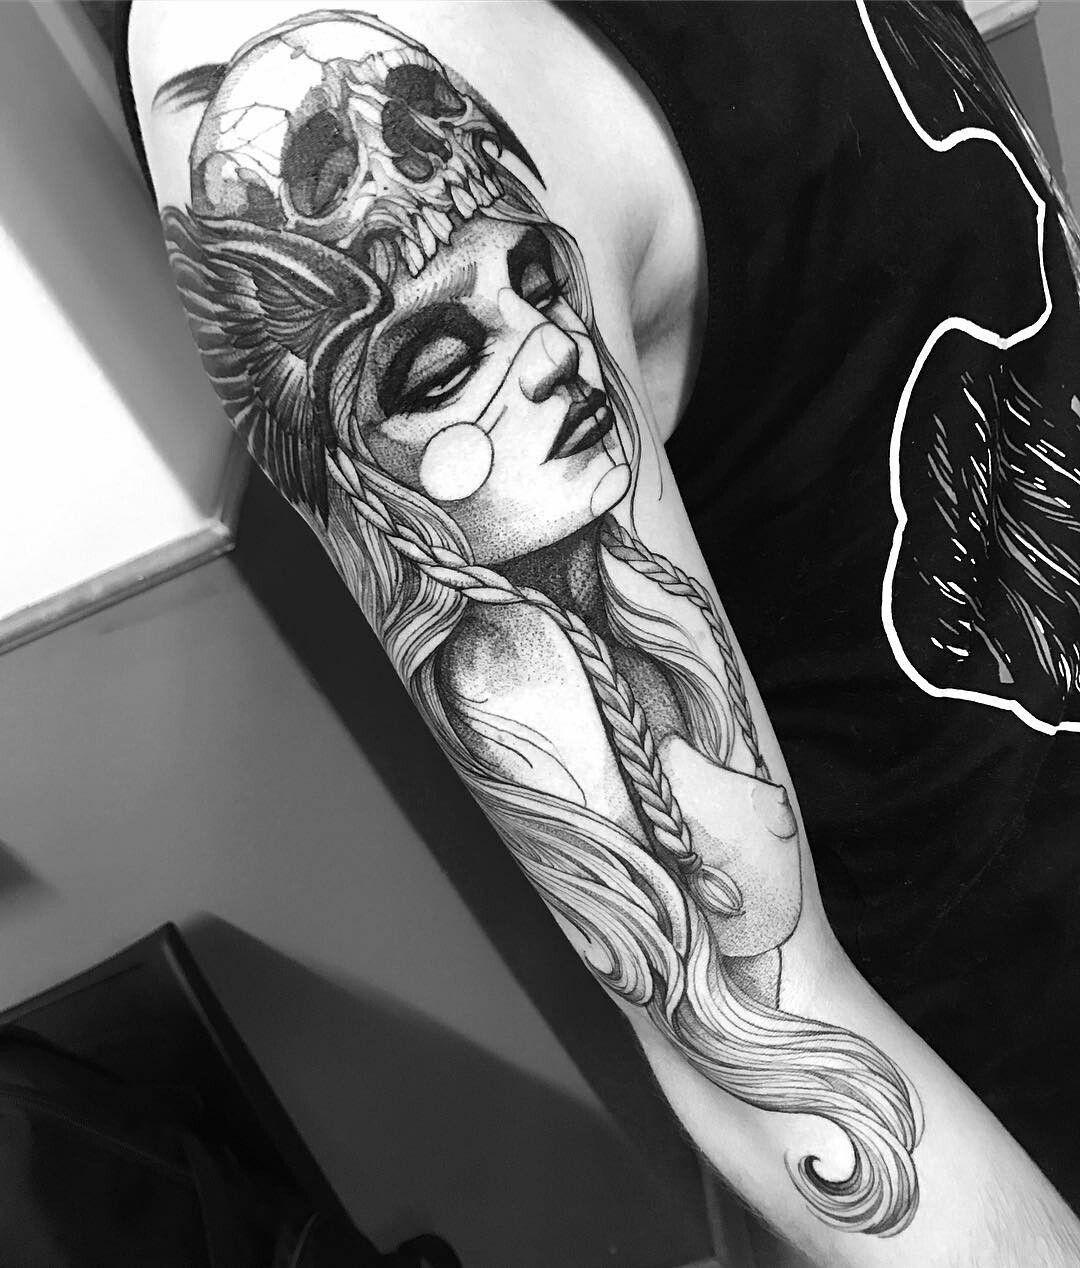 Pin by Daniel Lucas on Tatuagens e ideias | Pinterest - Tattoo Studio Bielefeld